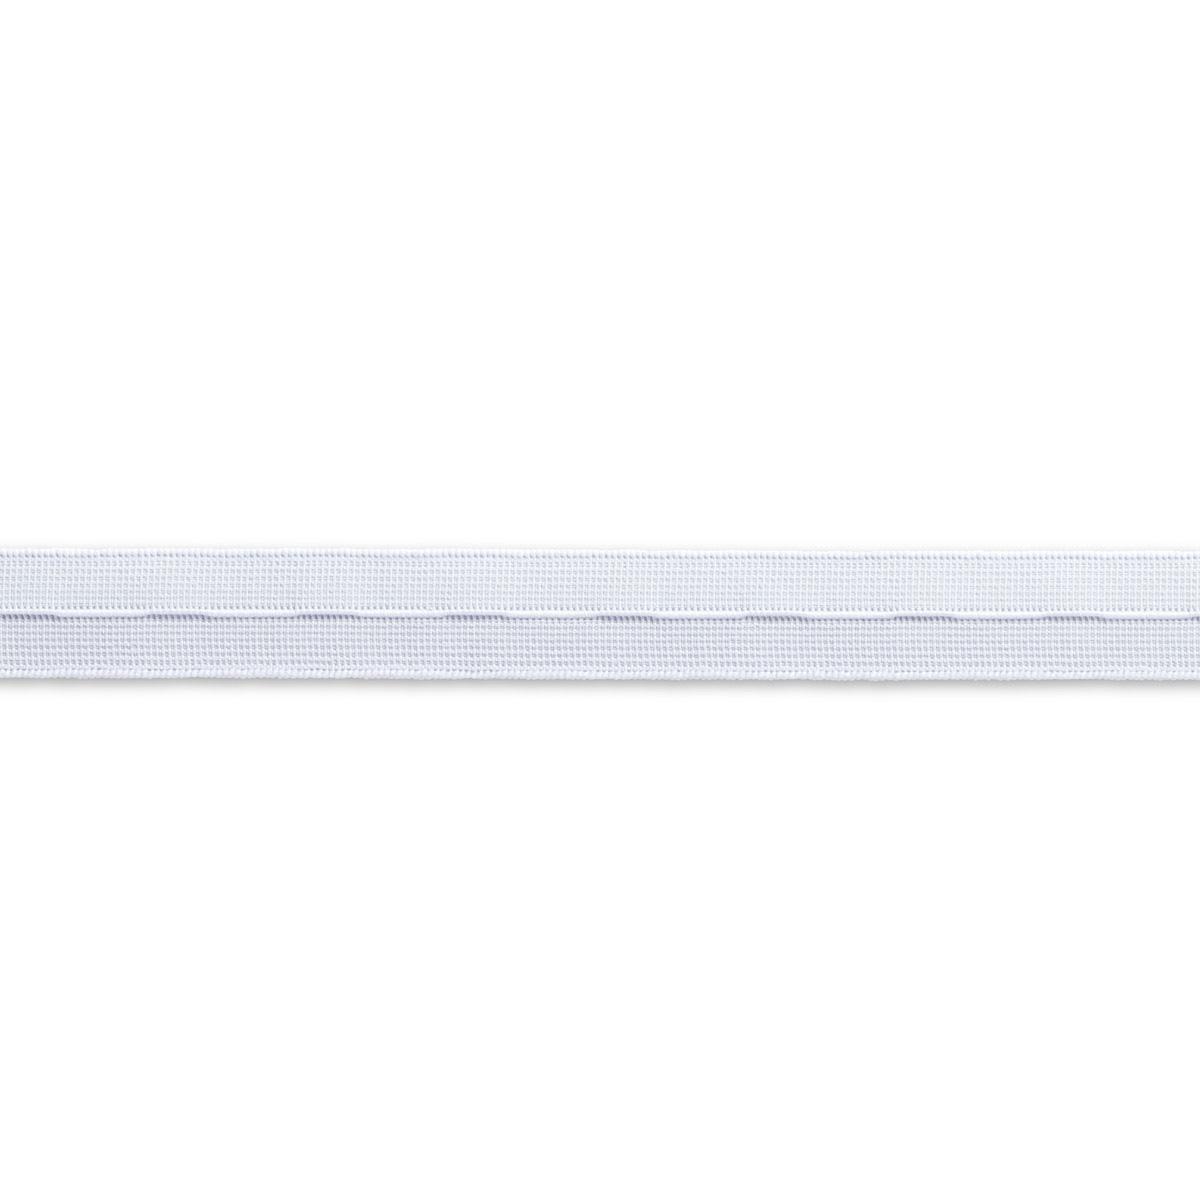 956052 Эластичная лента с прорезными петлями тканая 18мм*10м белый цв. Prym